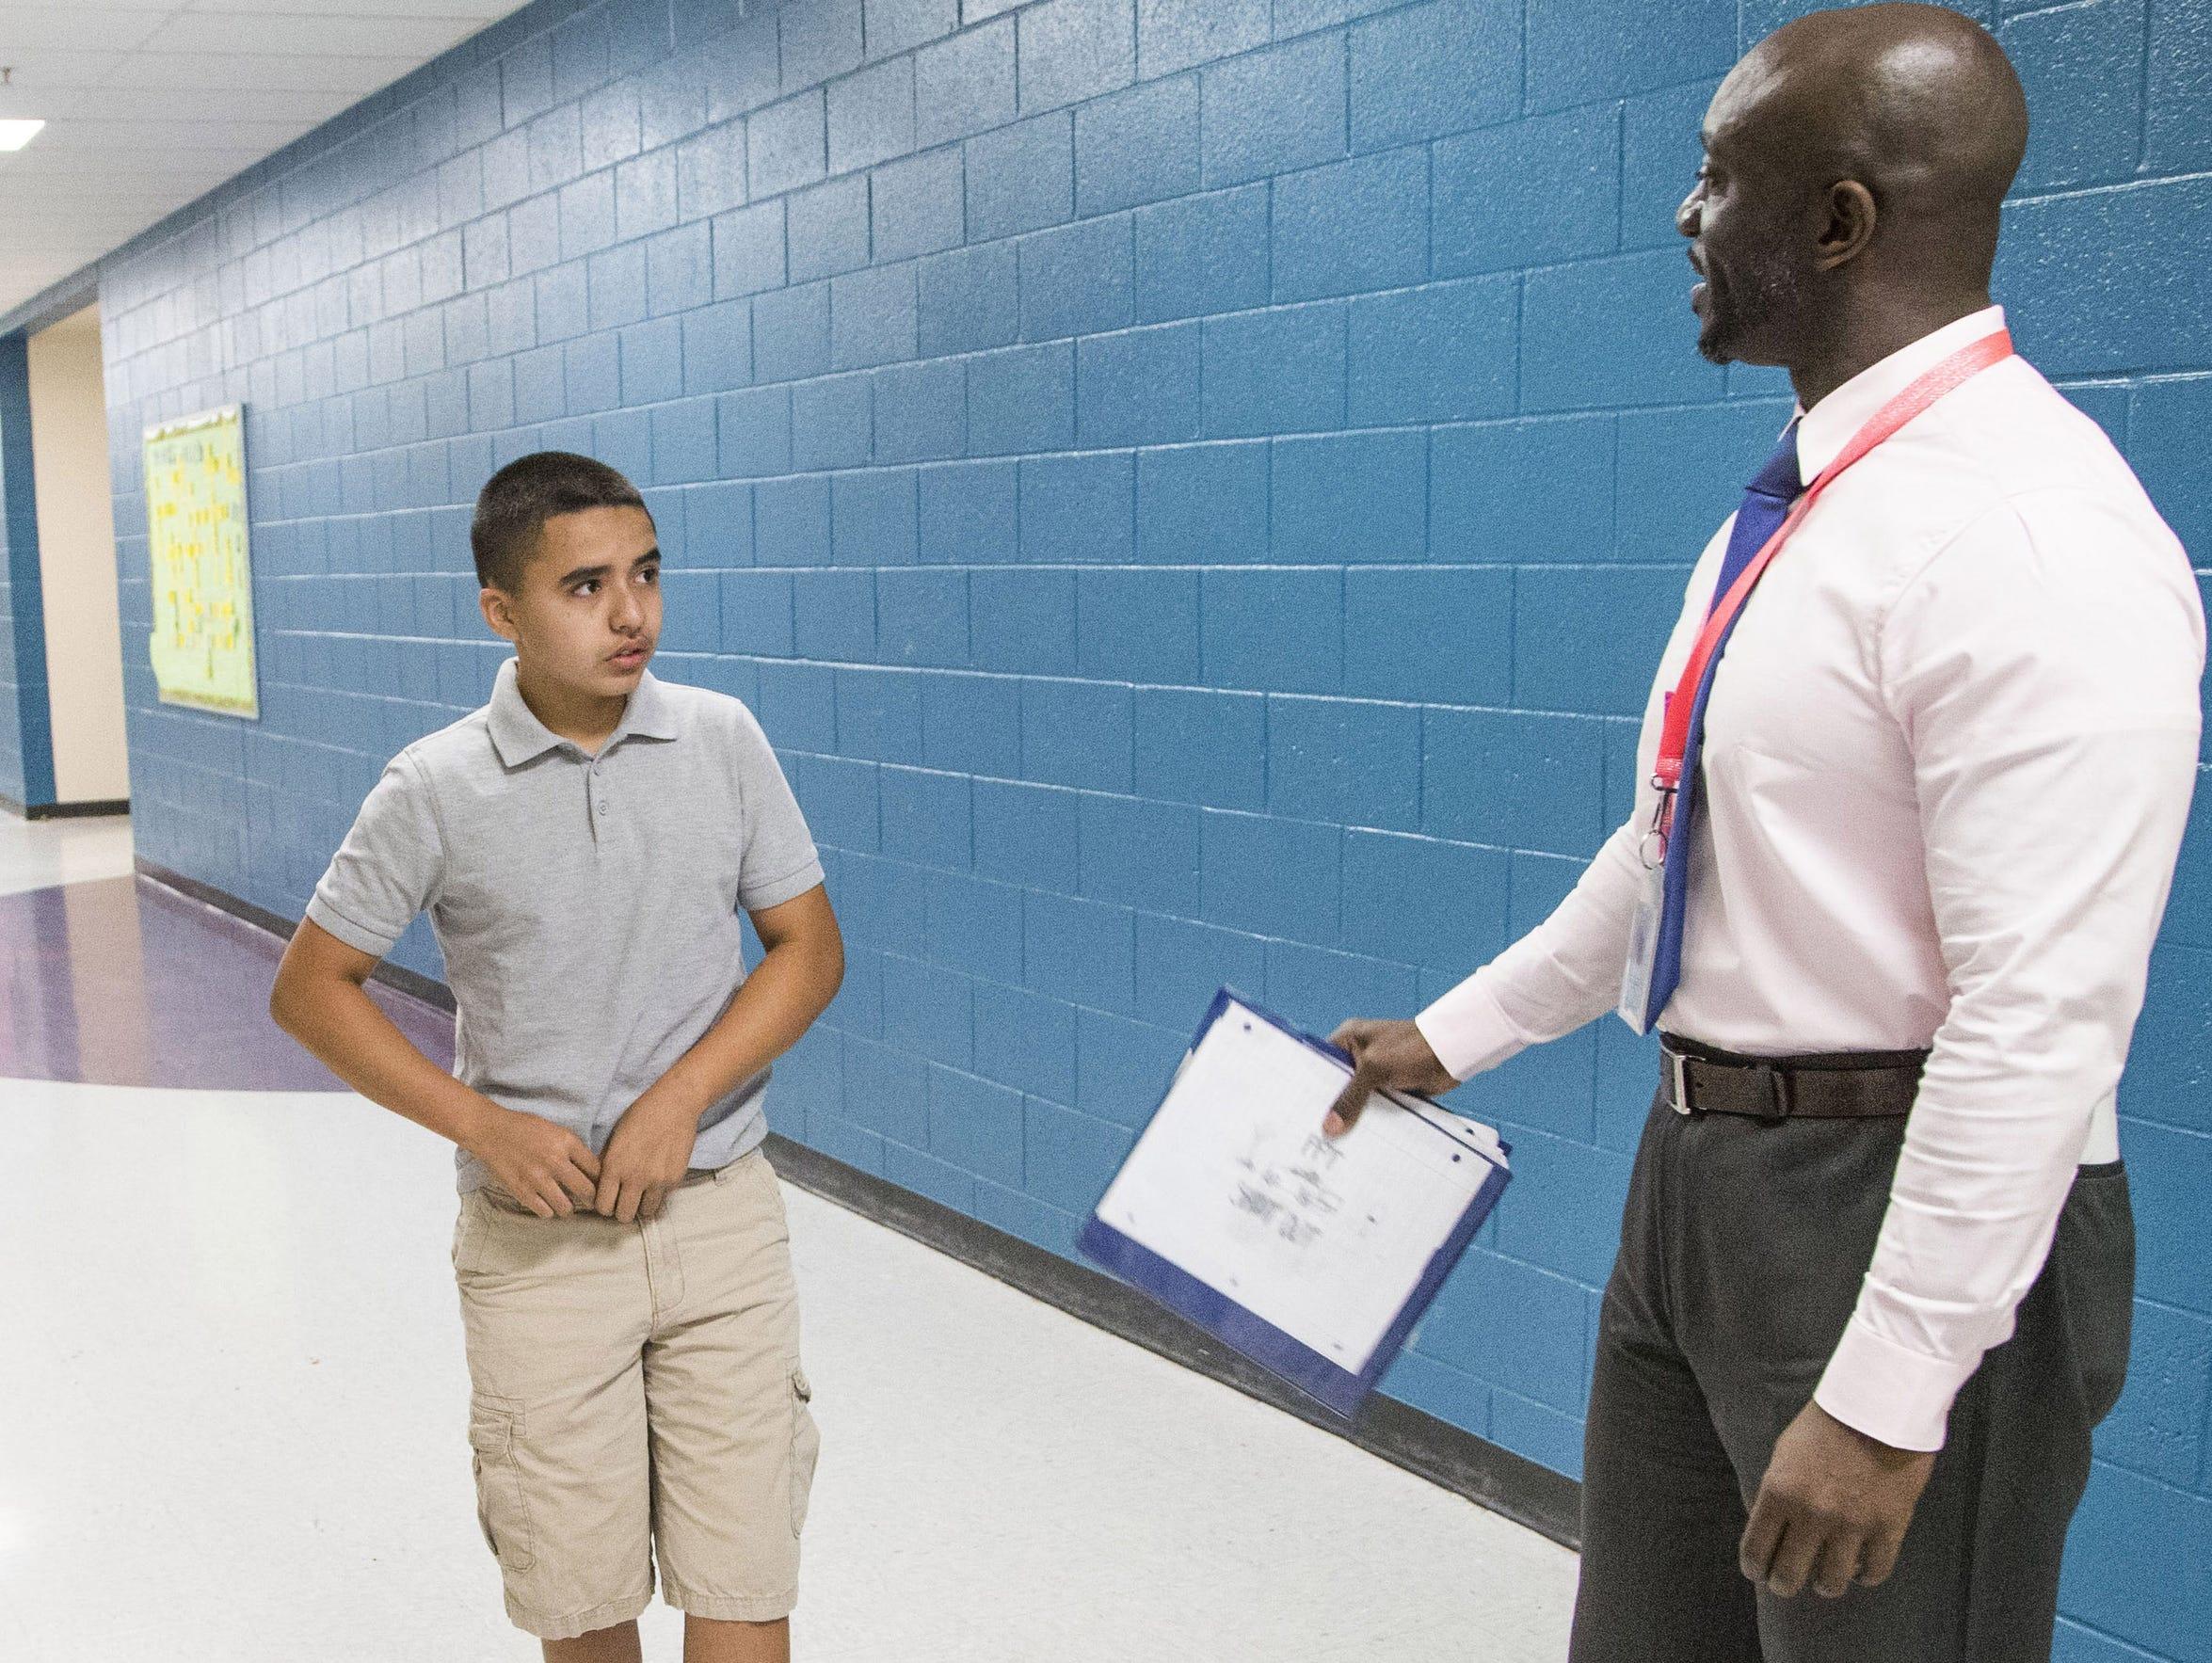 Principal Eric Atuahene reminds student Alex Mata Cevas